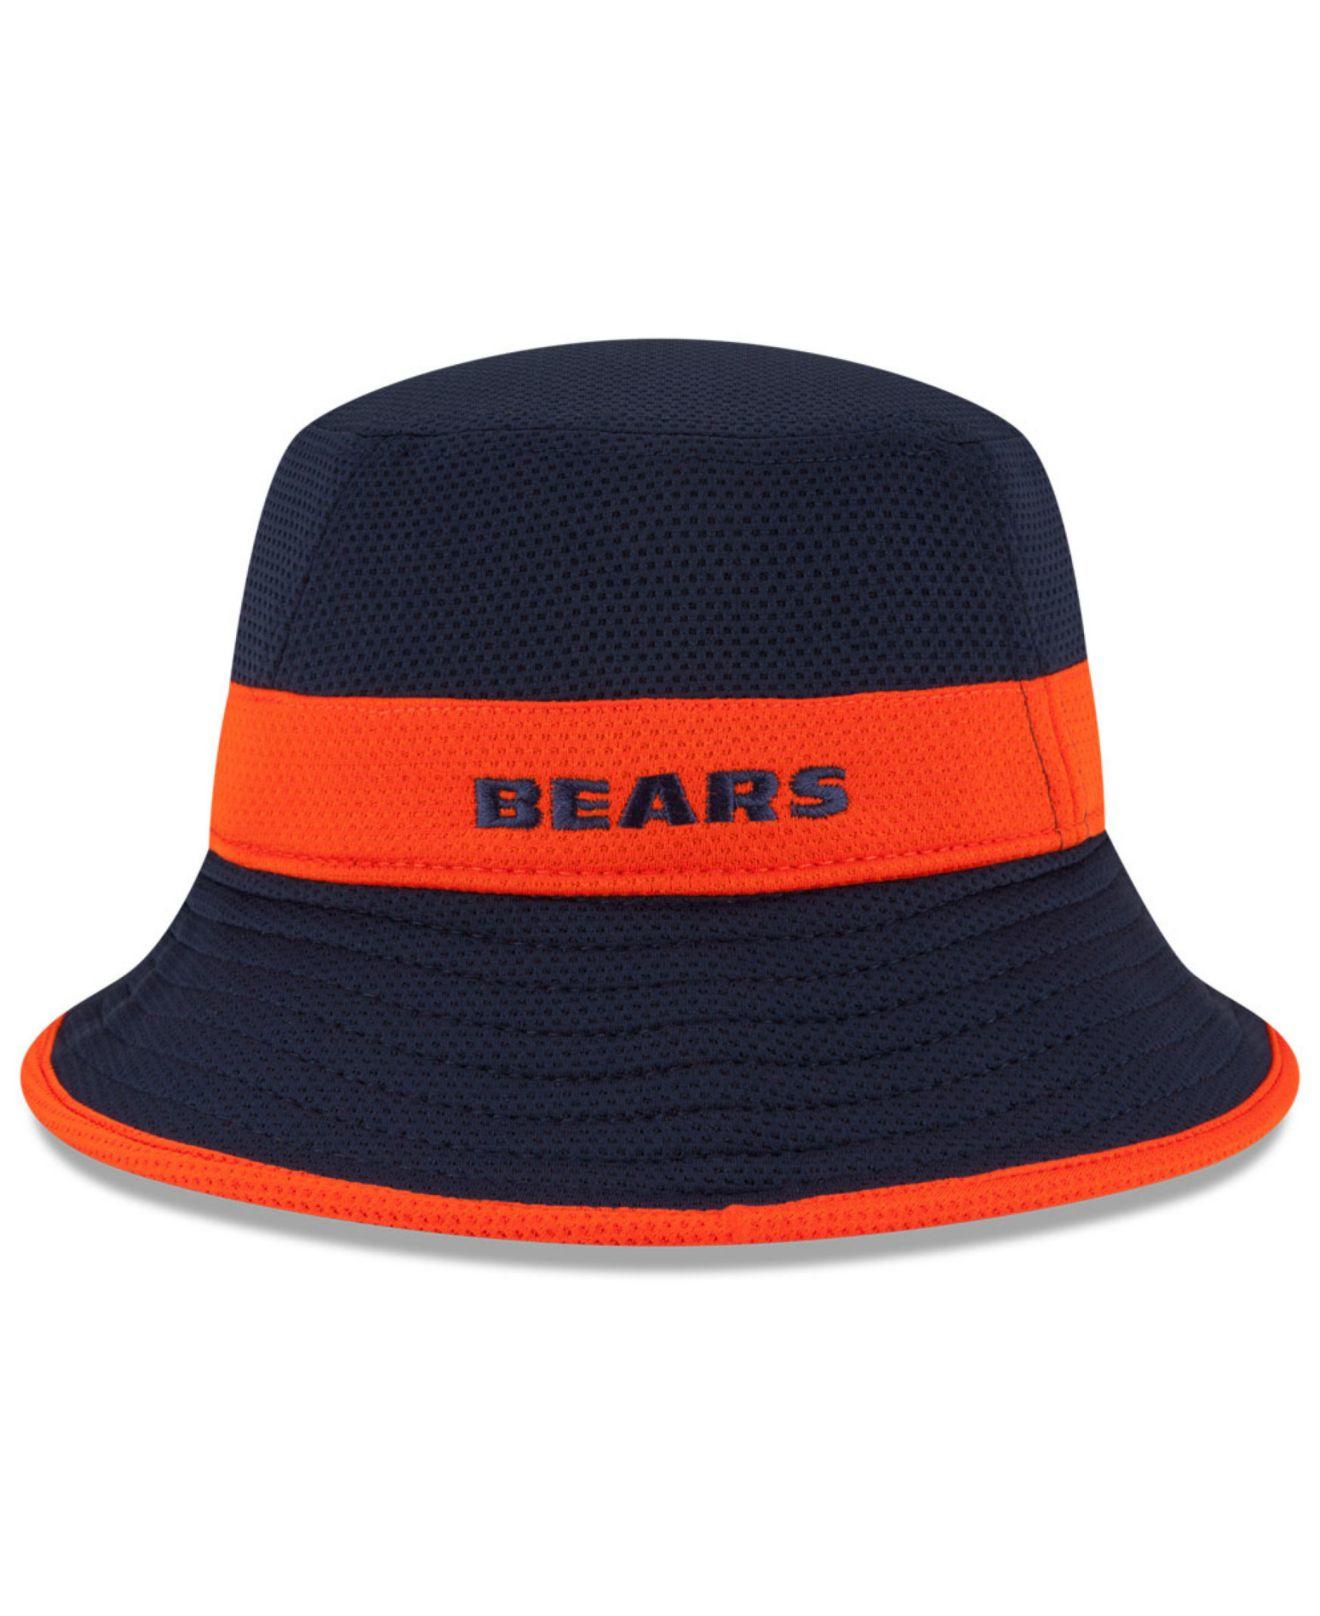 Lyst - Ktz Chicago Bears Training Camp Reverse Bucket Hat in Blue ... 50e10dd05